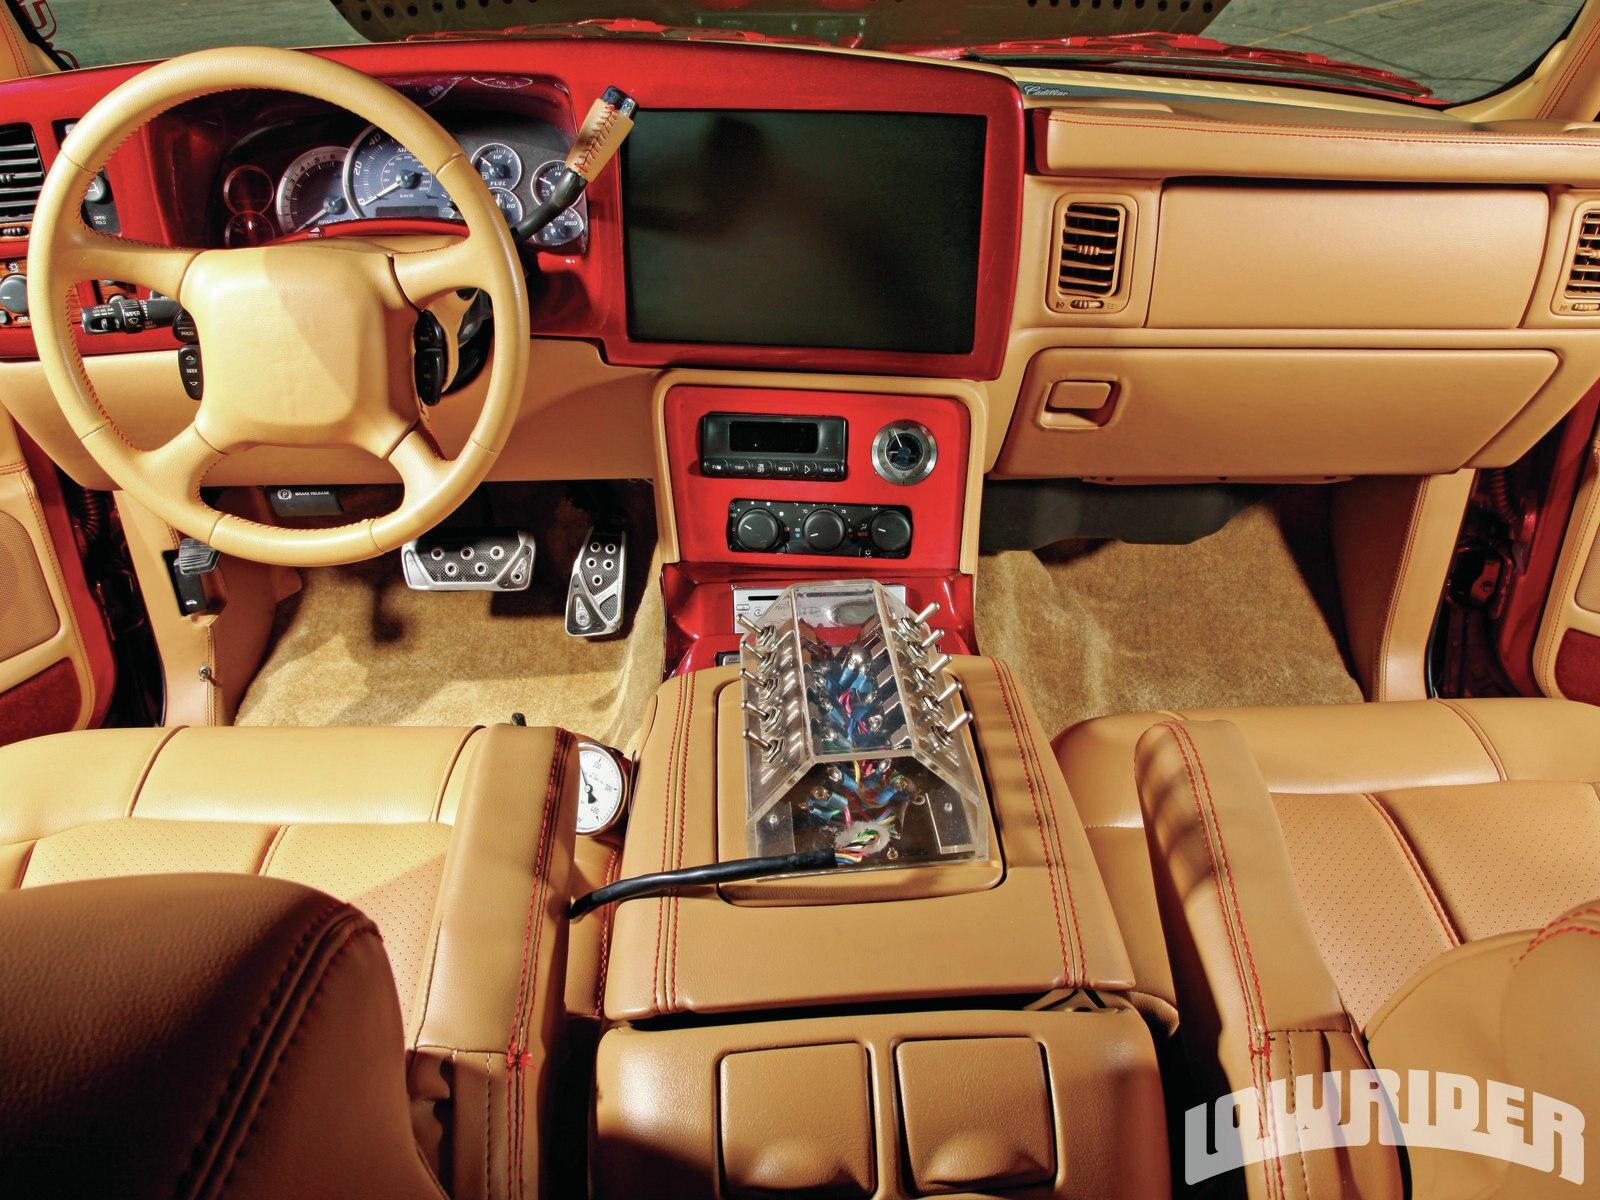 2002 Cadillac Escalade - Lowrider Magazine